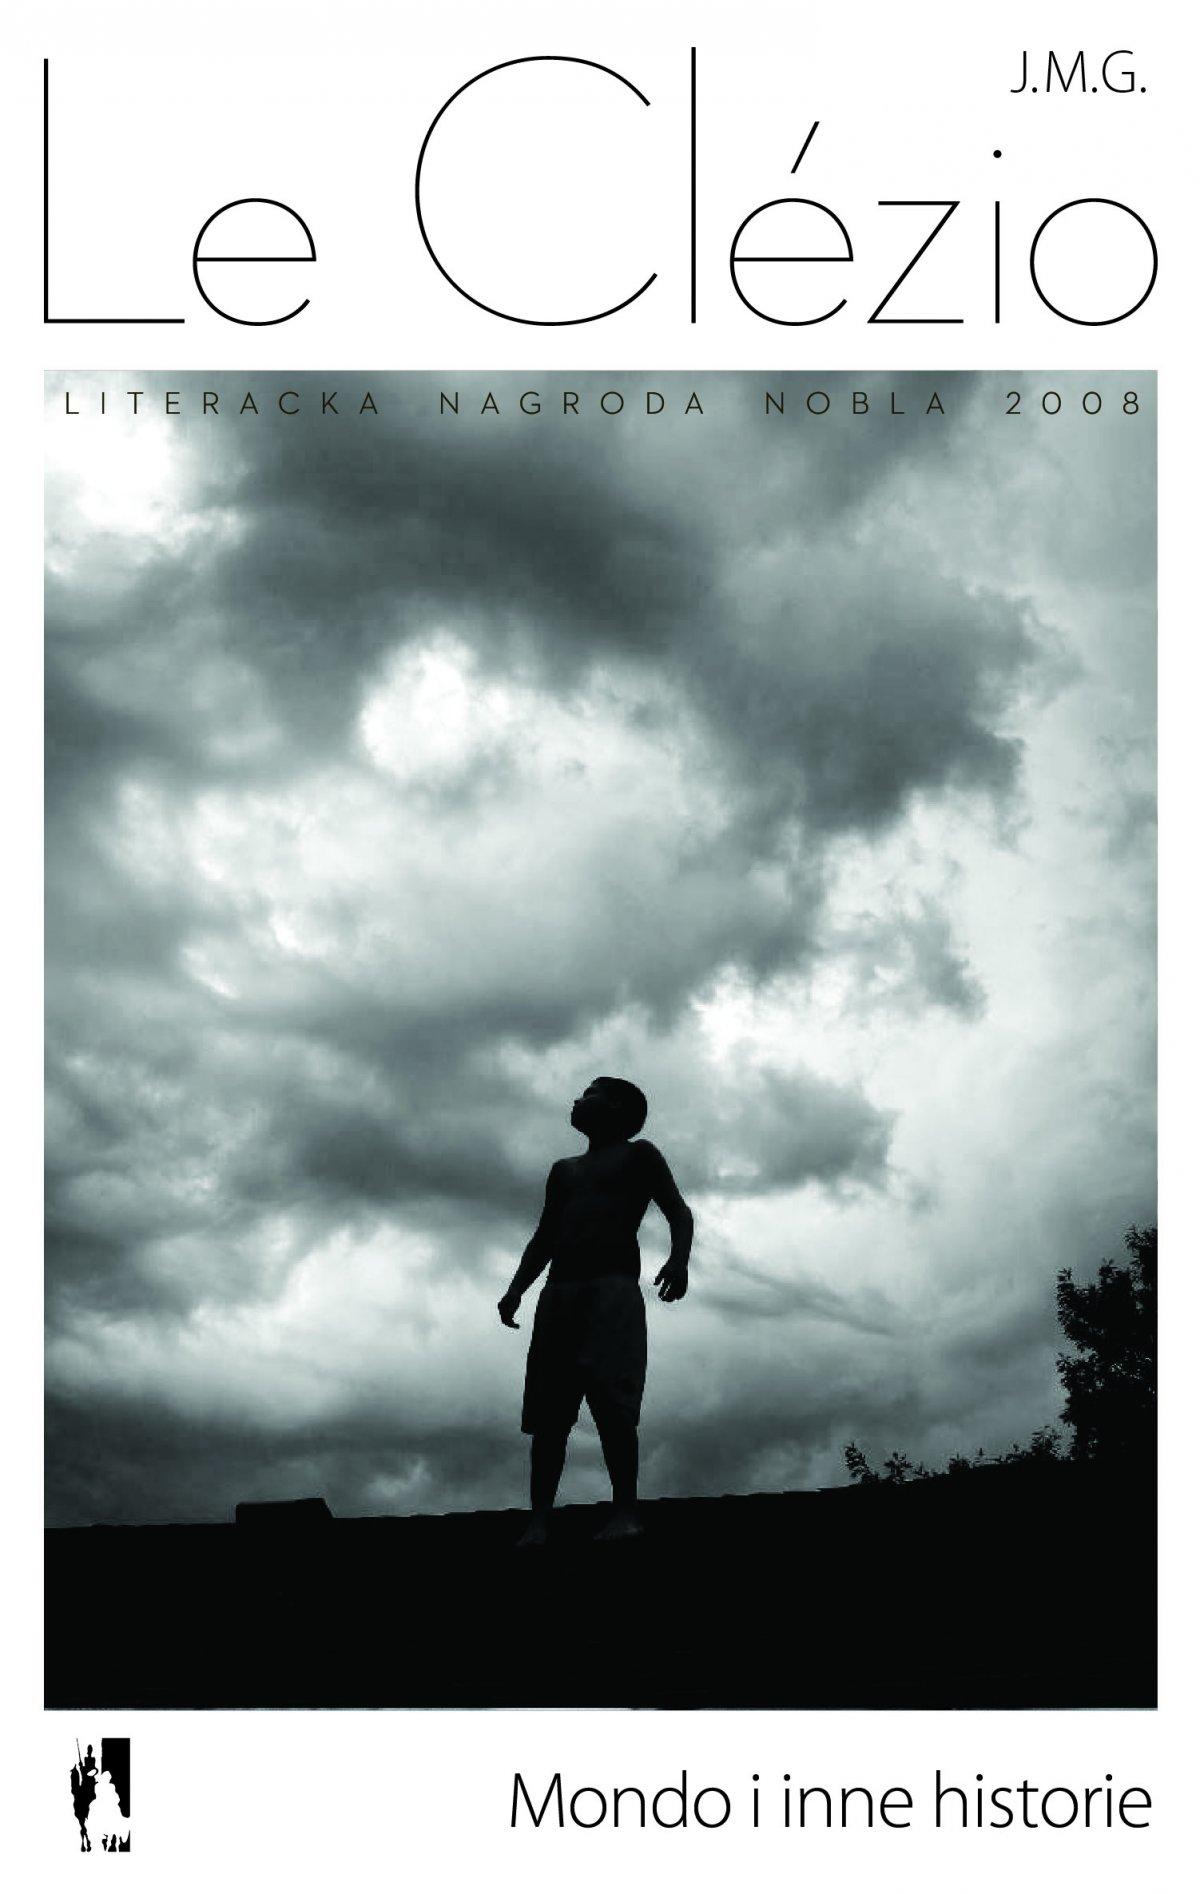 Mondo i inne historie - Ebook (Książka na Kindle) do pobrania w formacie MOBI